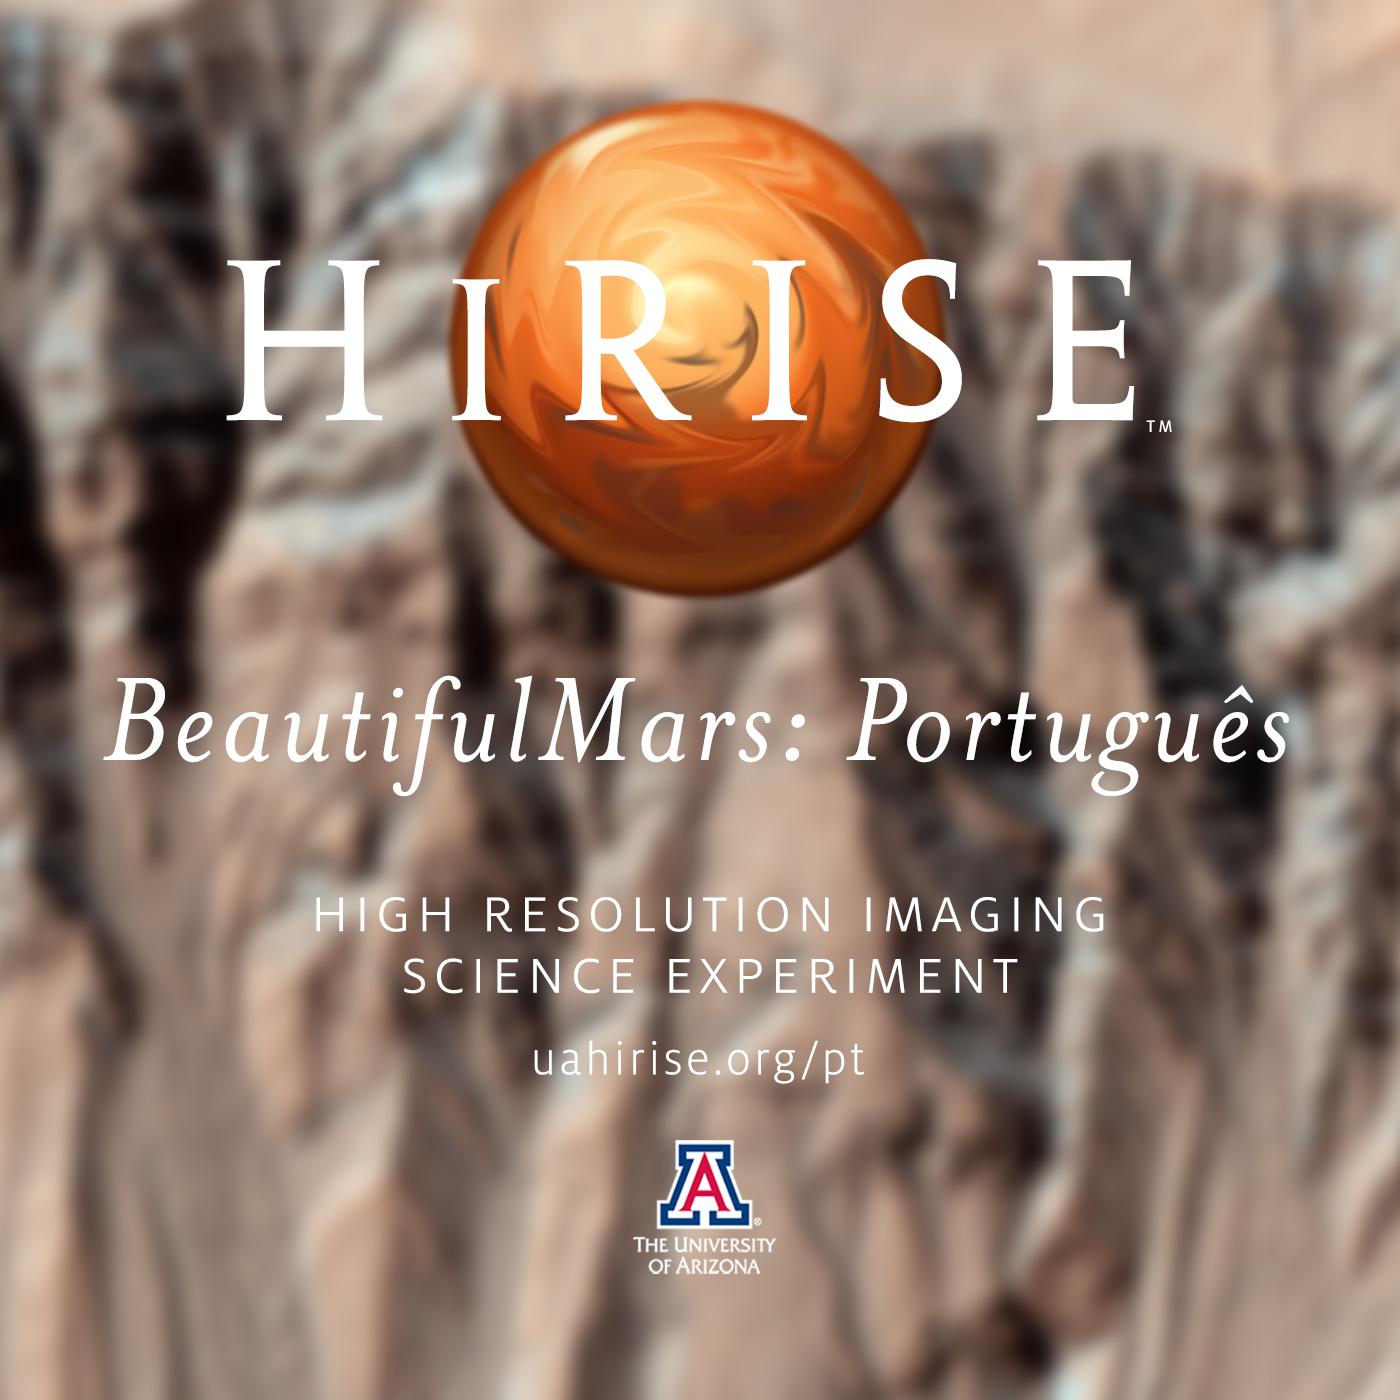 HiRISE: The BeautifulMars Podcast em português (Video)